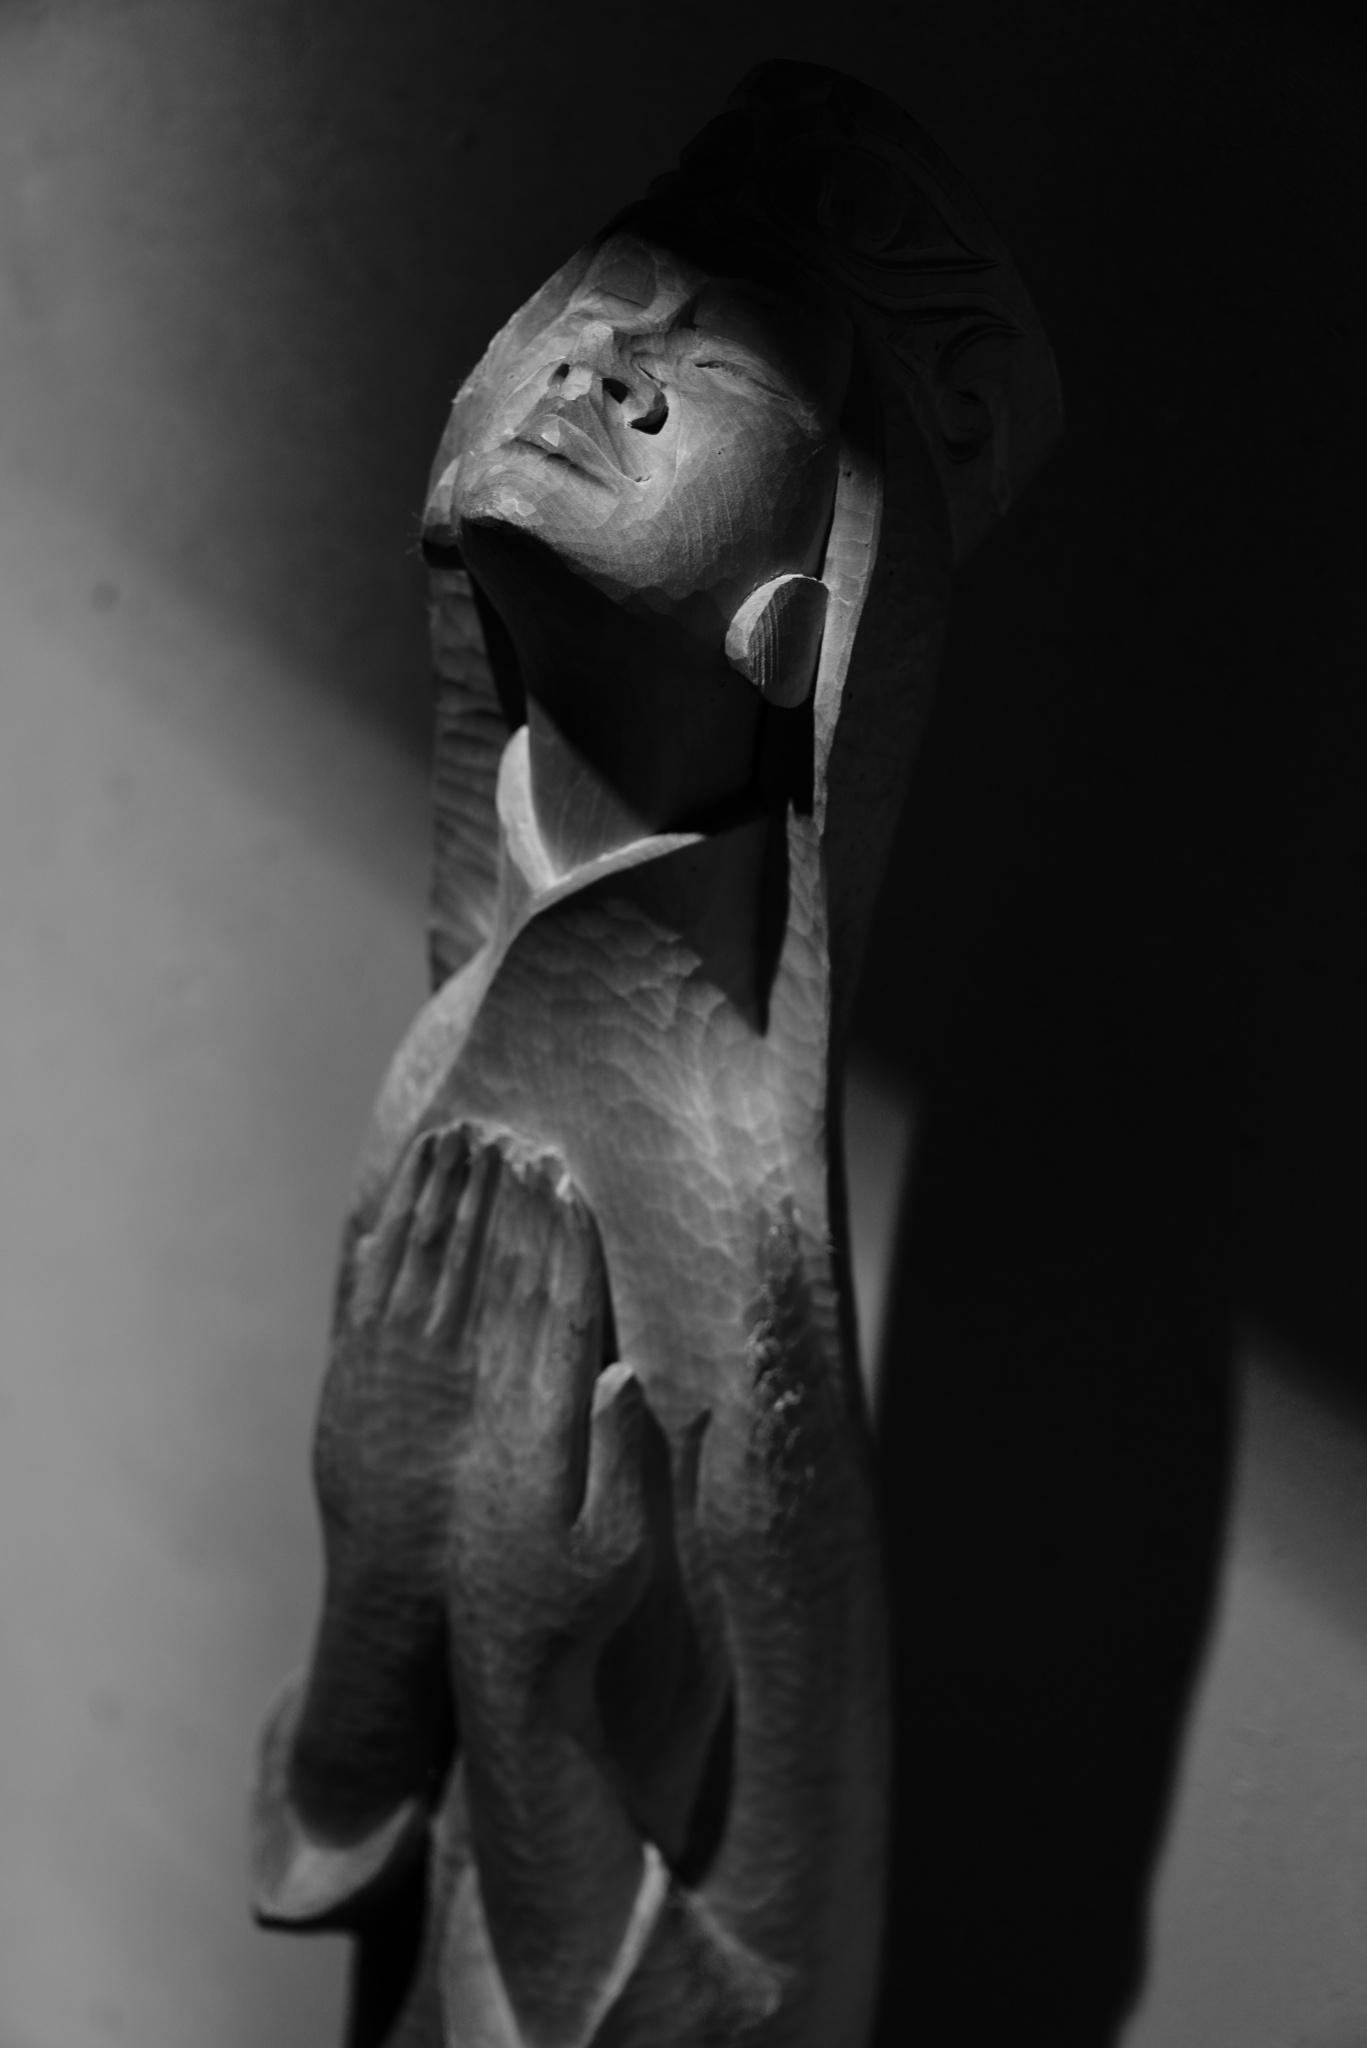 prayer by seiya kondo